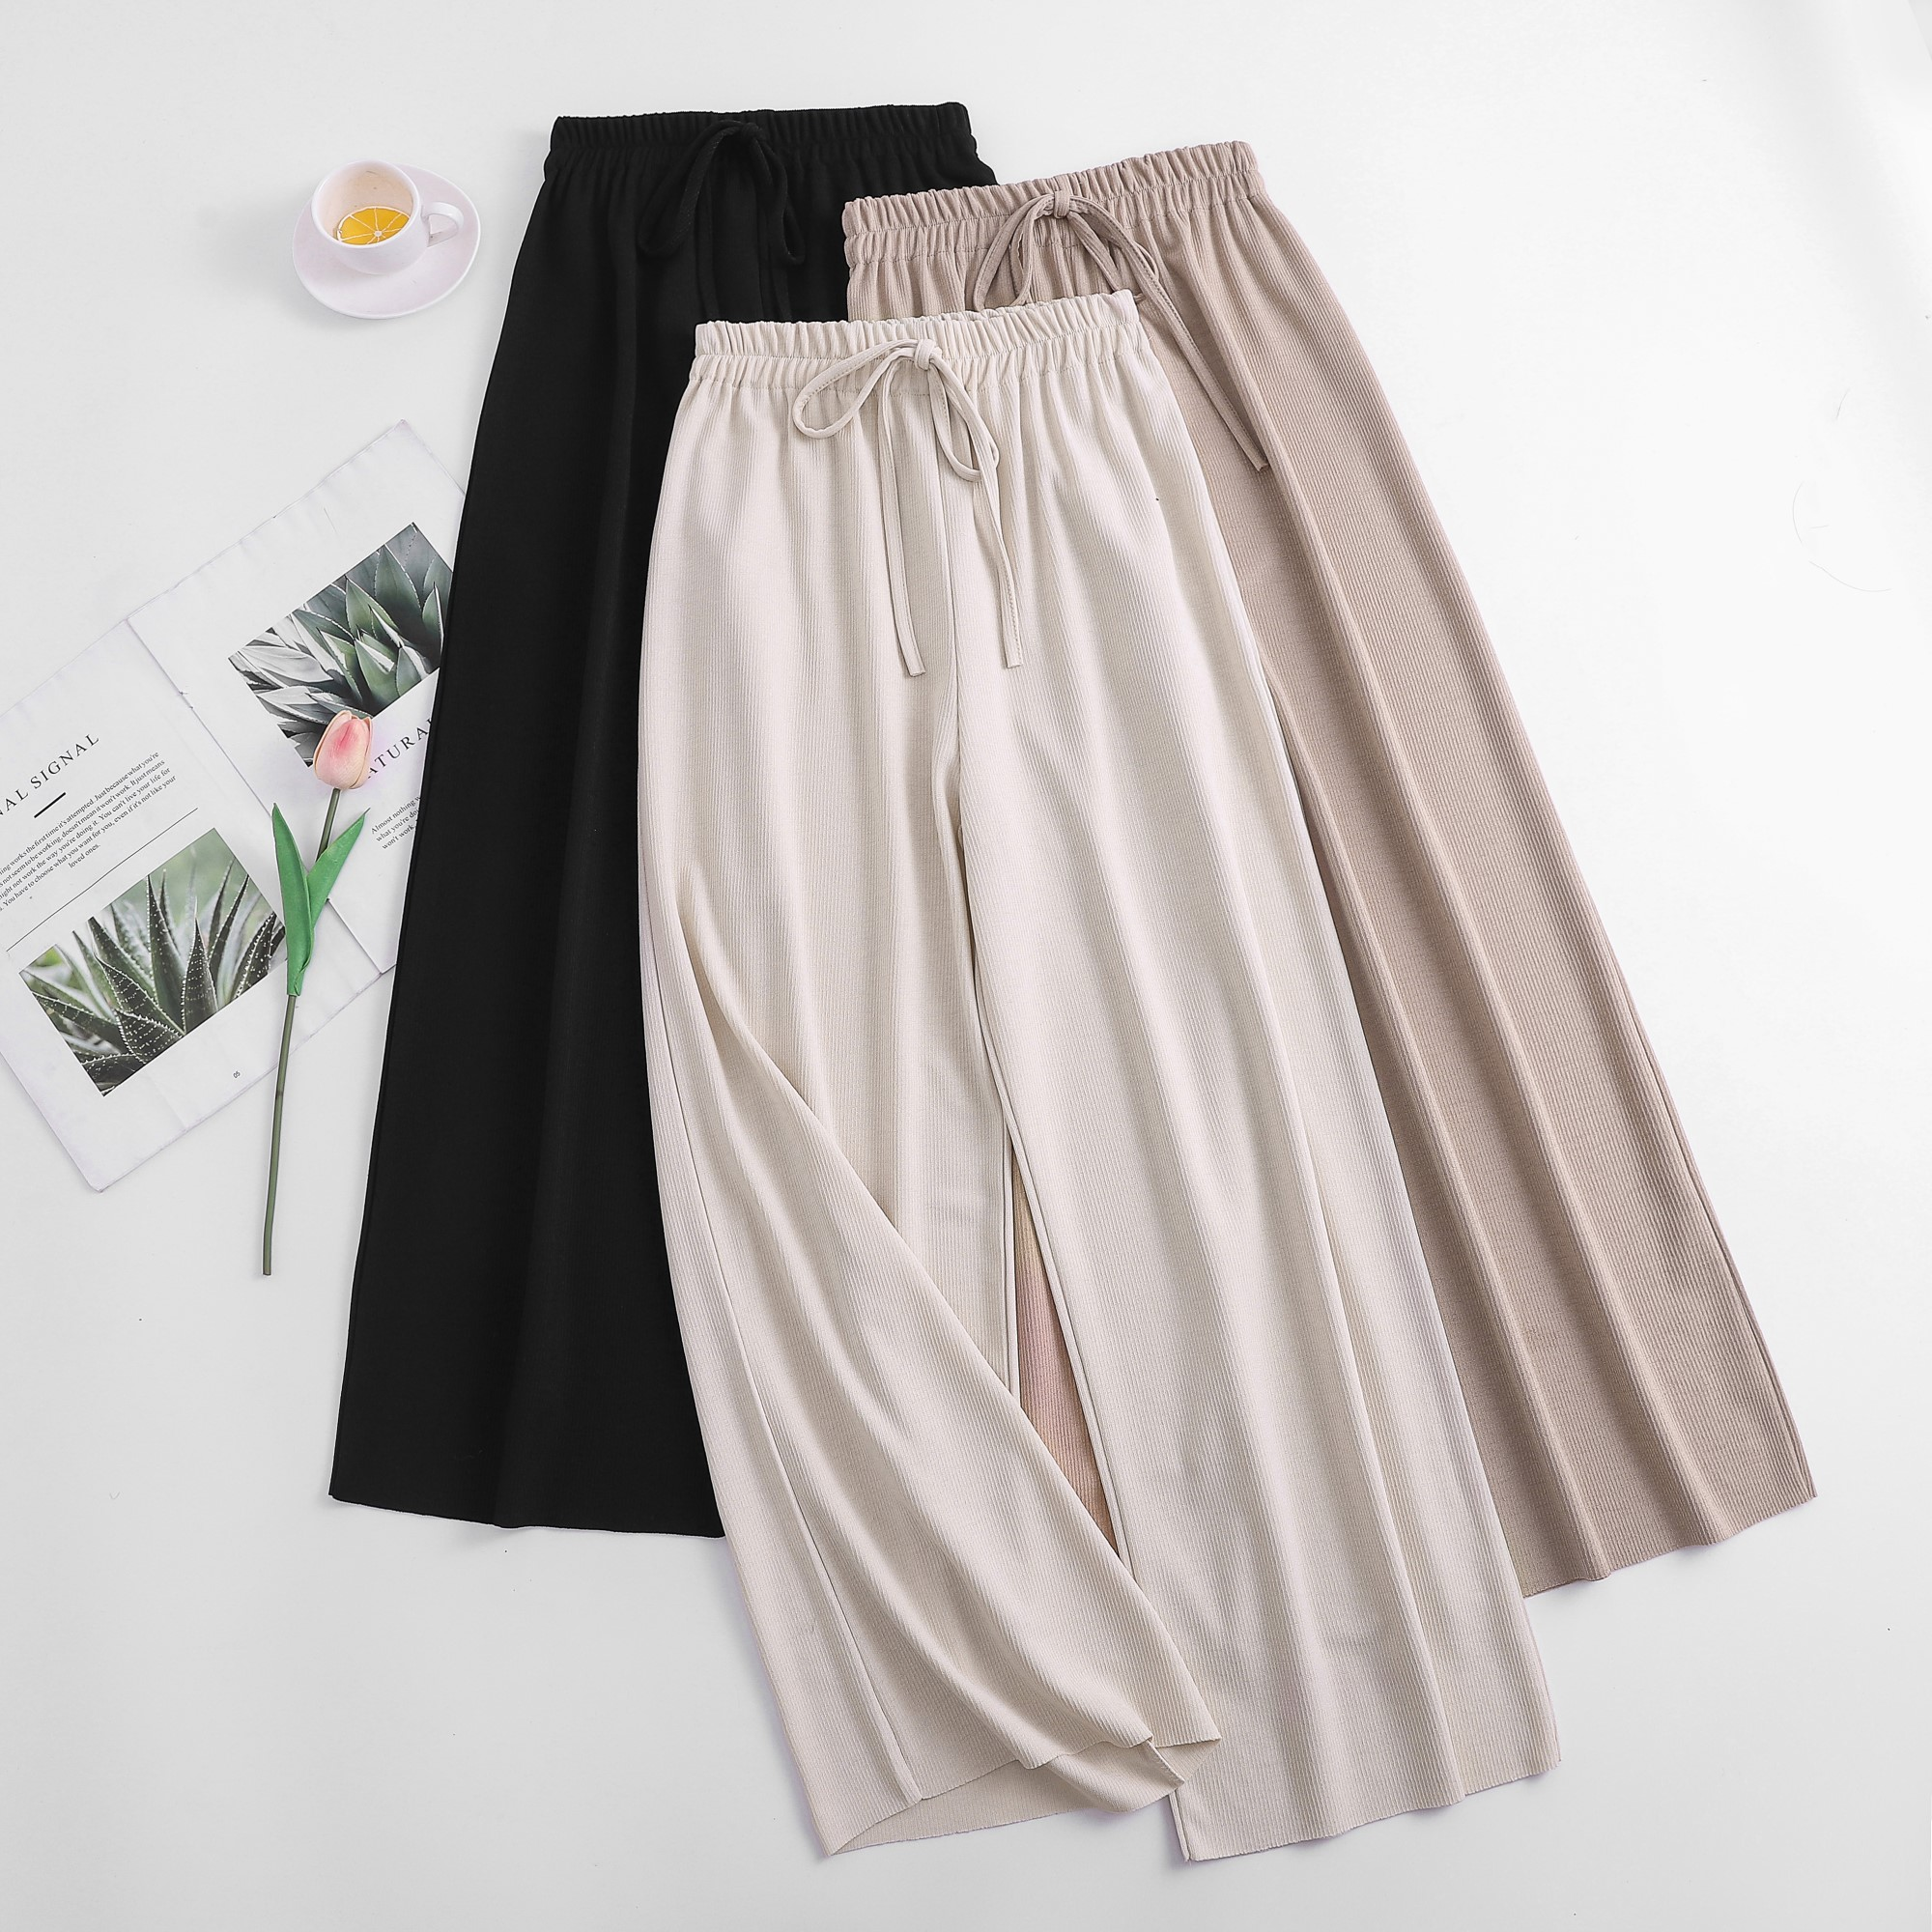 Womem   wide     leg     pants   fashion female vintage elegant elastic waist thin knitted   pant   casual trousers summer autumn